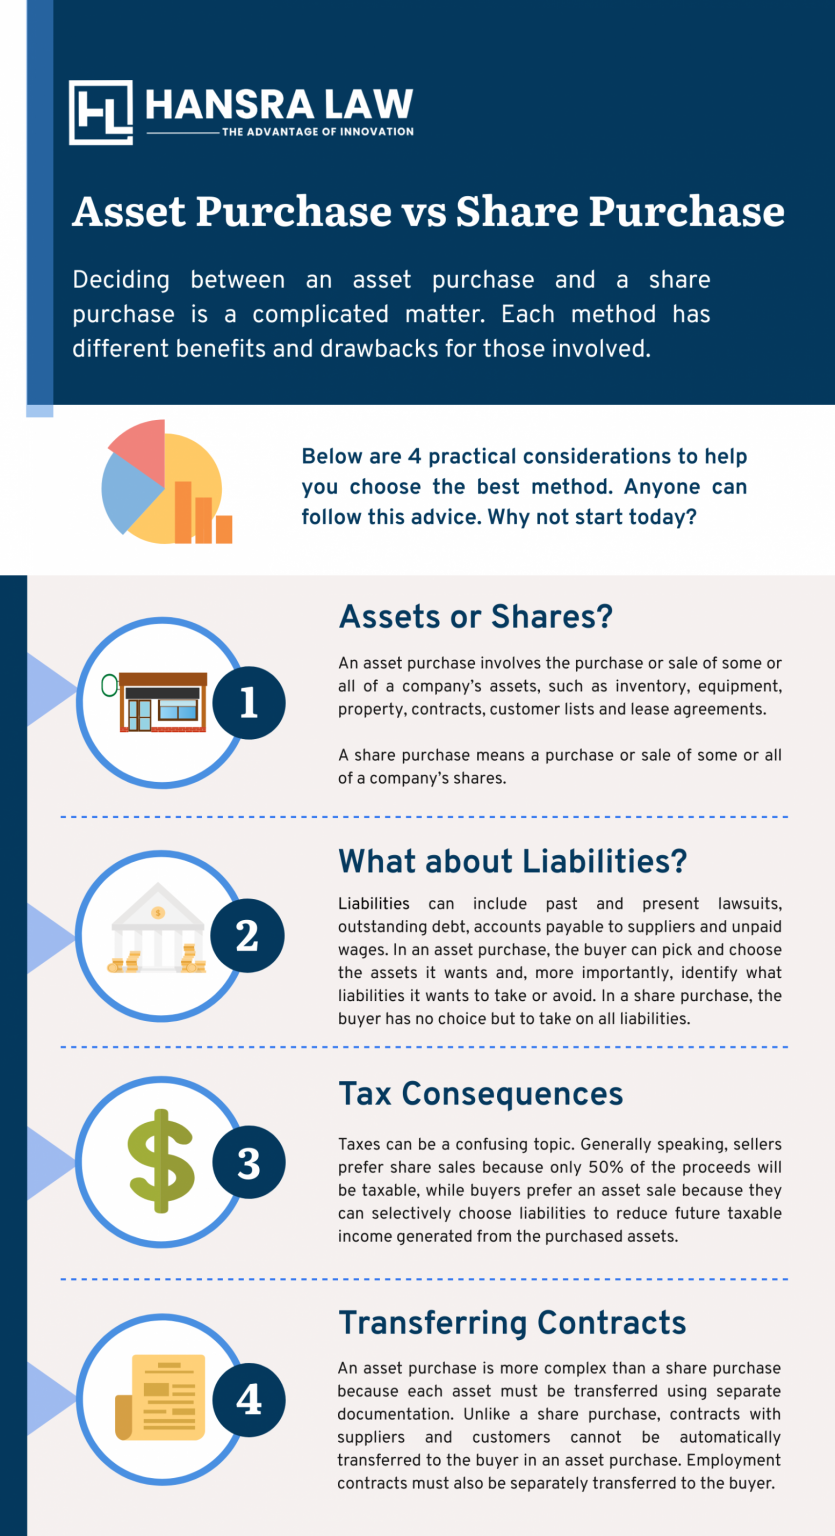 Hansra Law - asset purchase vs share purchase chart